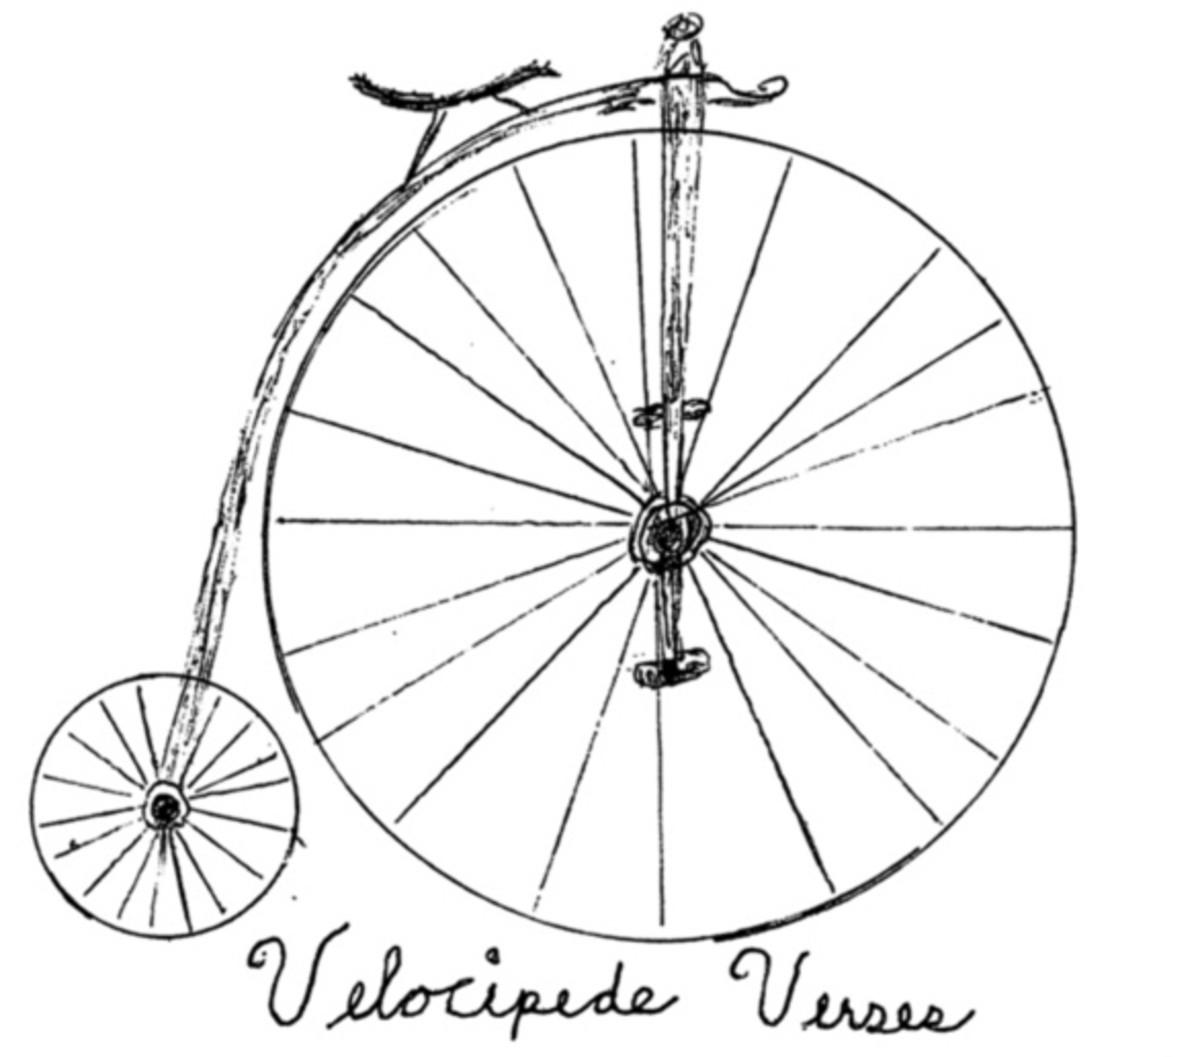 Velocipede Verses #3: 'Burbing Woes